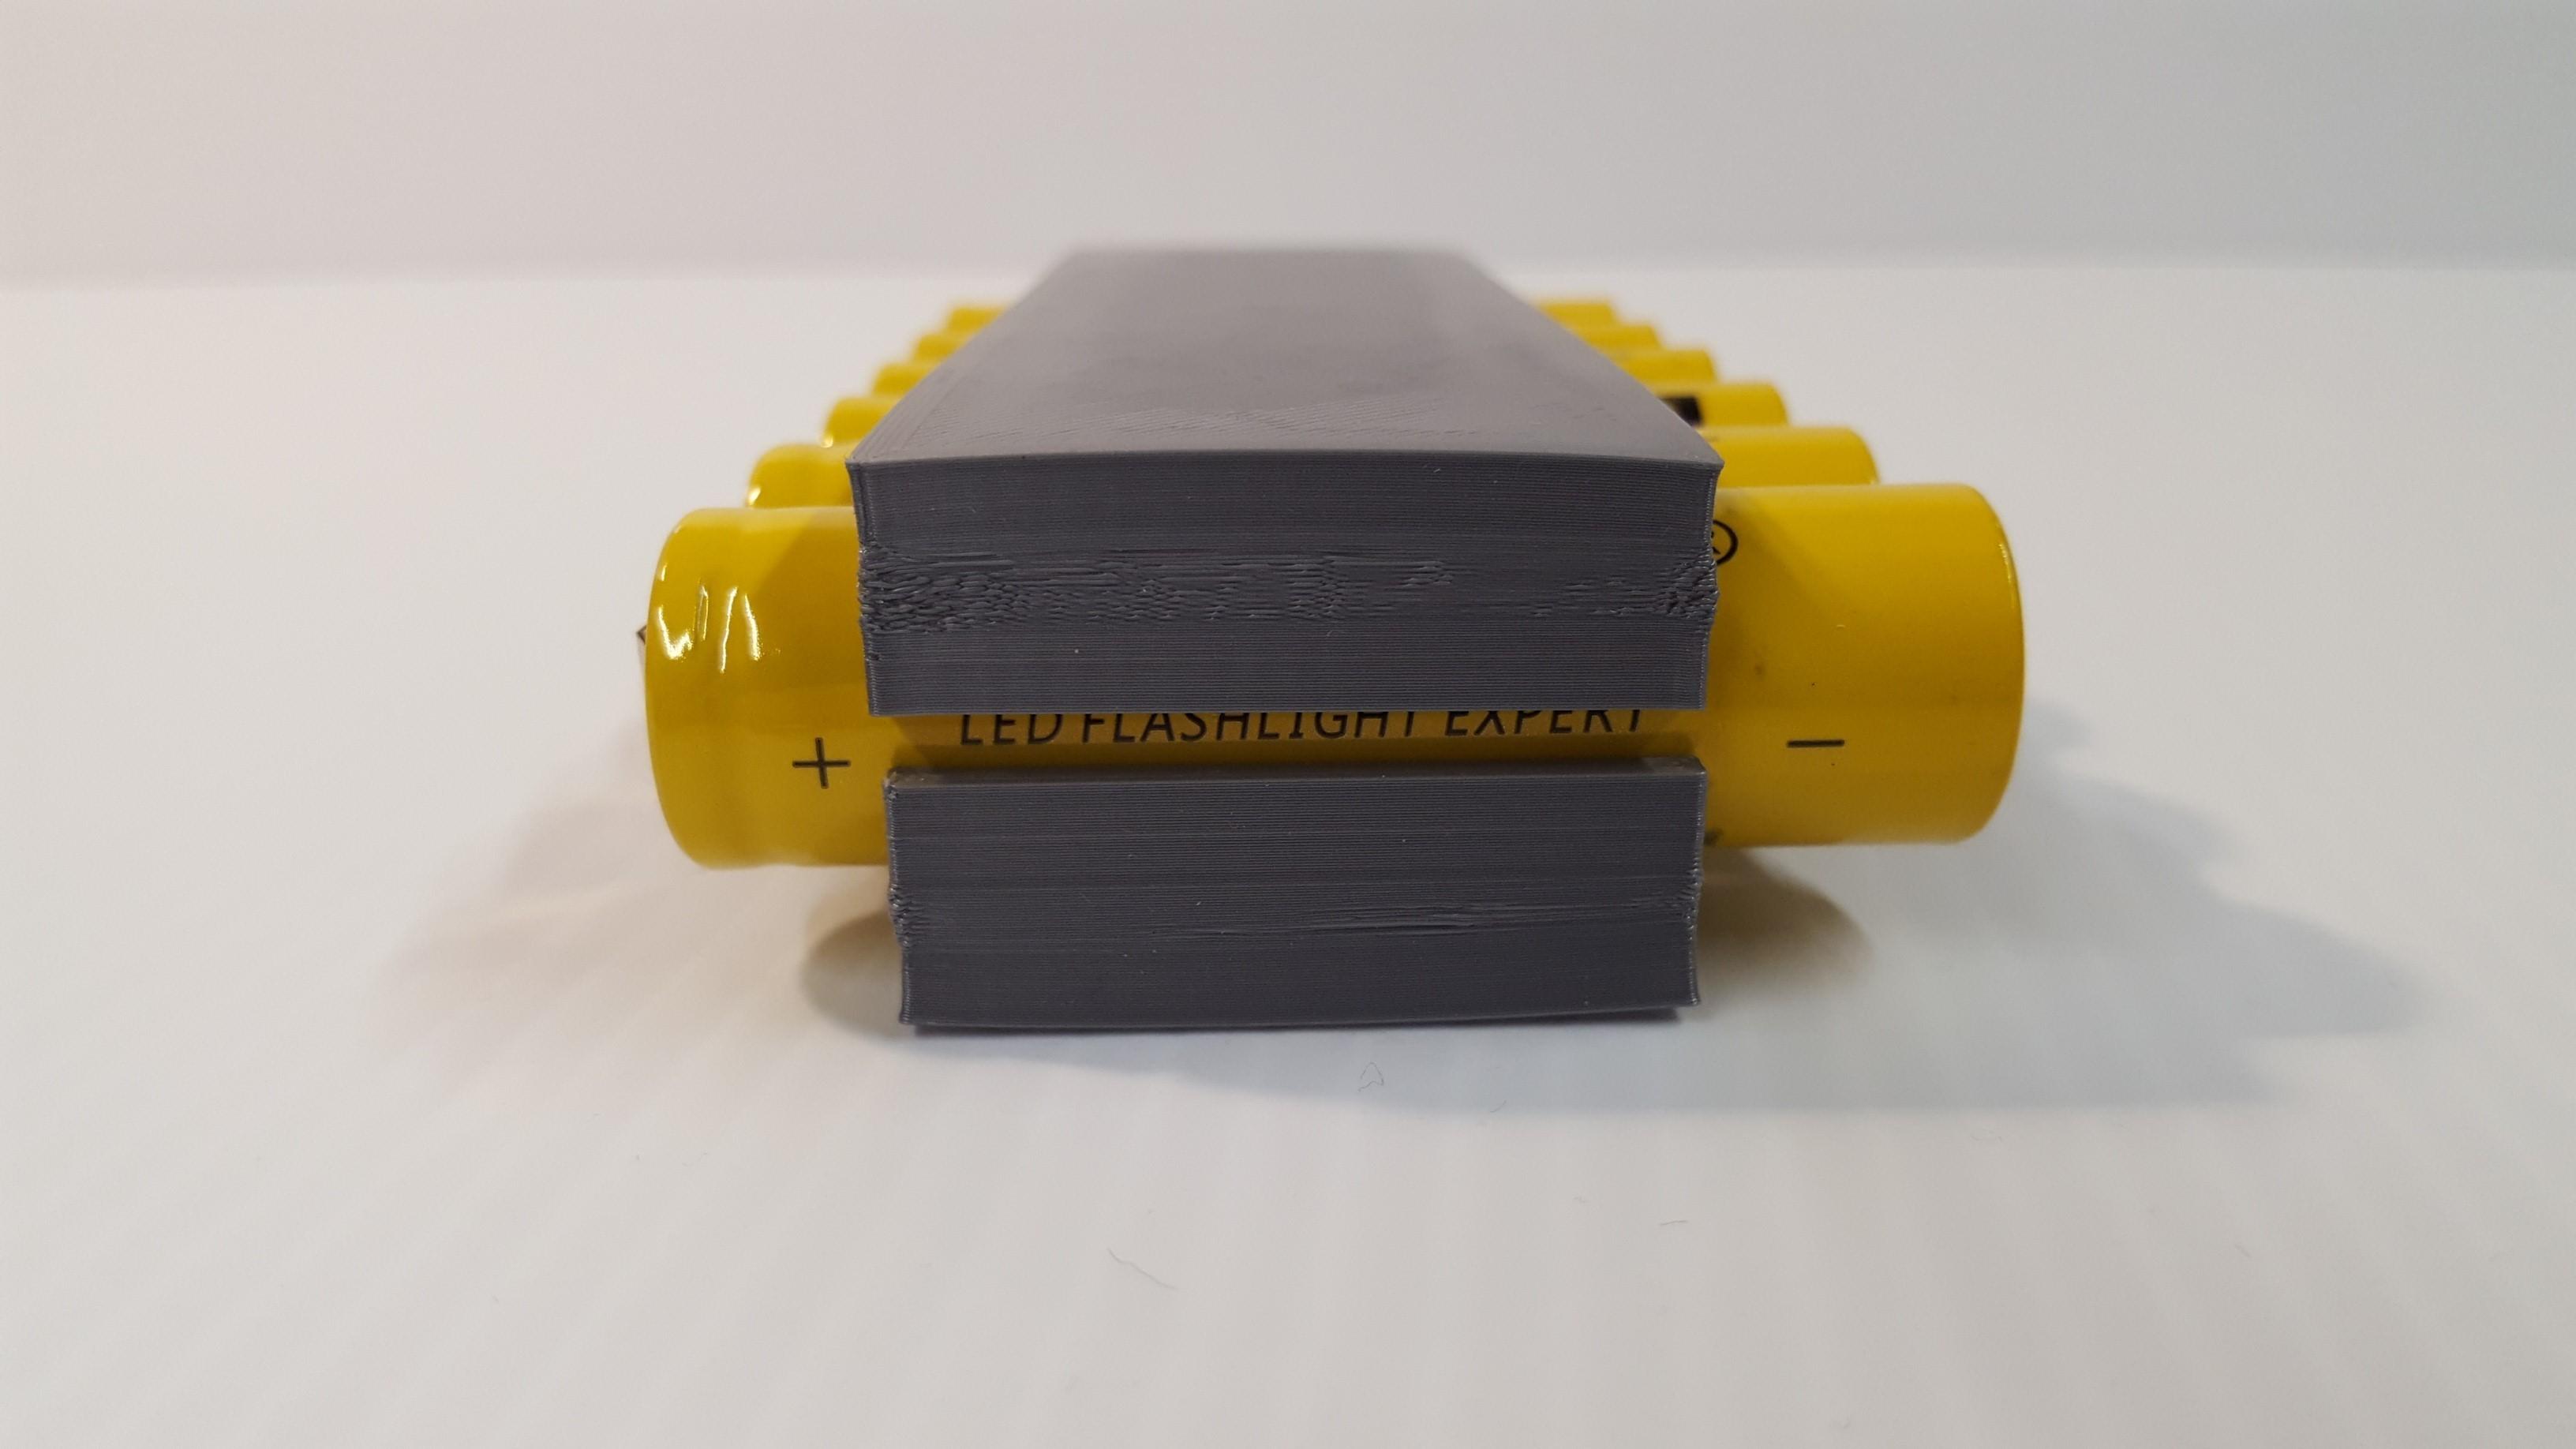 Batt3.jpg Download STL file TR 18650 Battery Holder • Object to 3D print, GForceFX